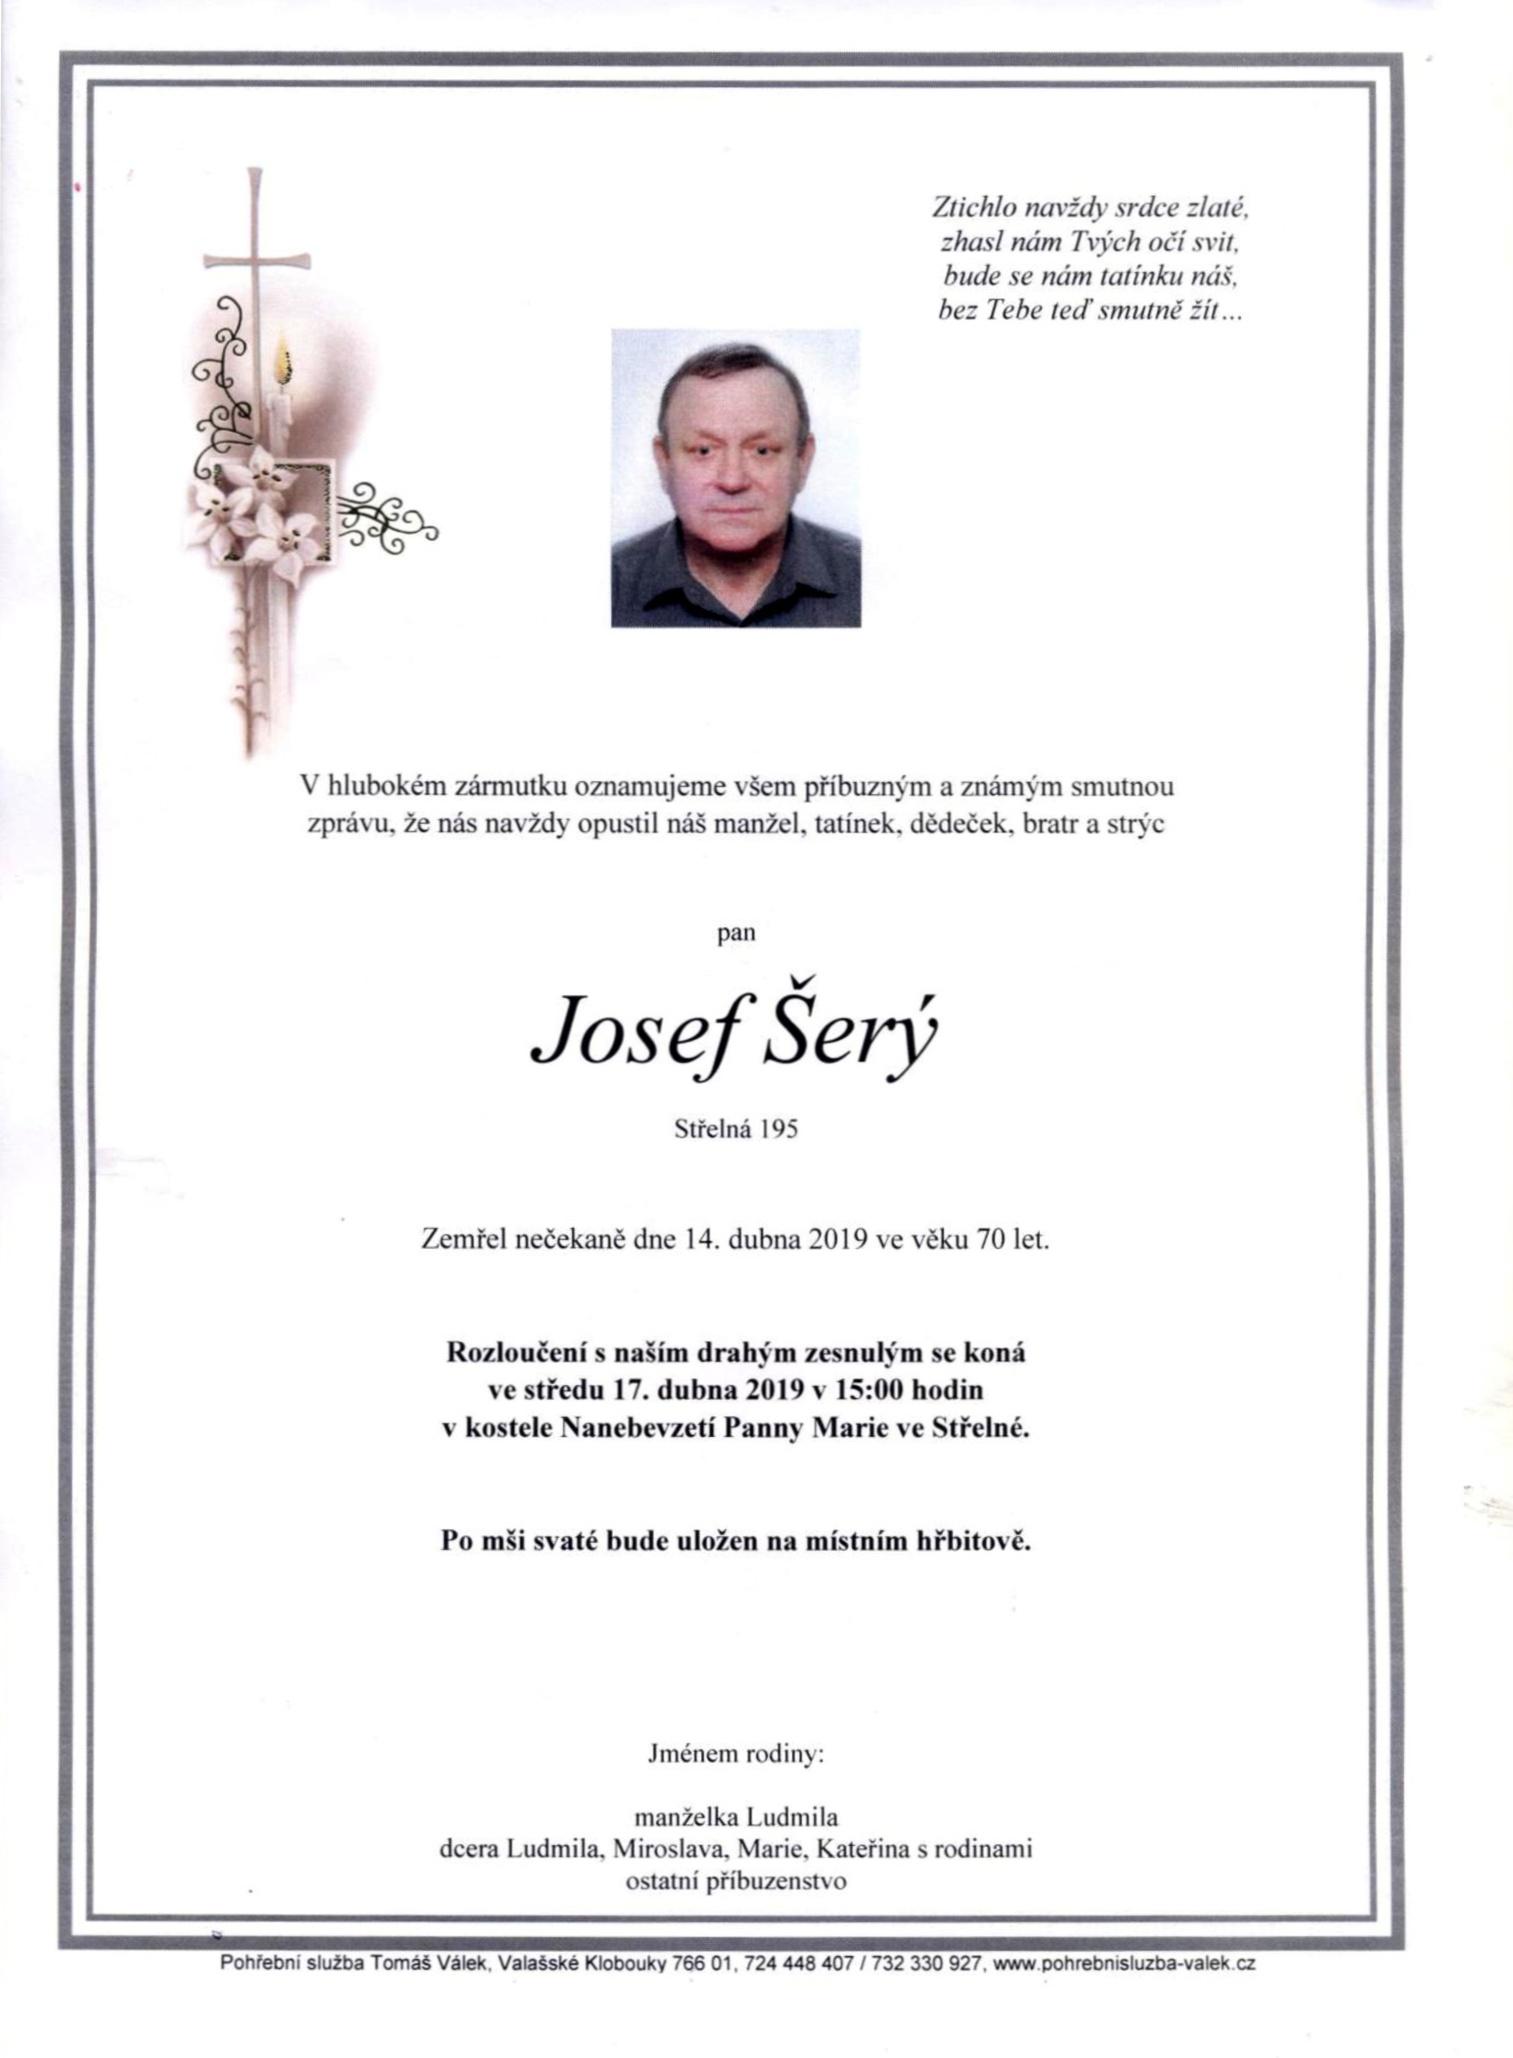 Josef Šerý